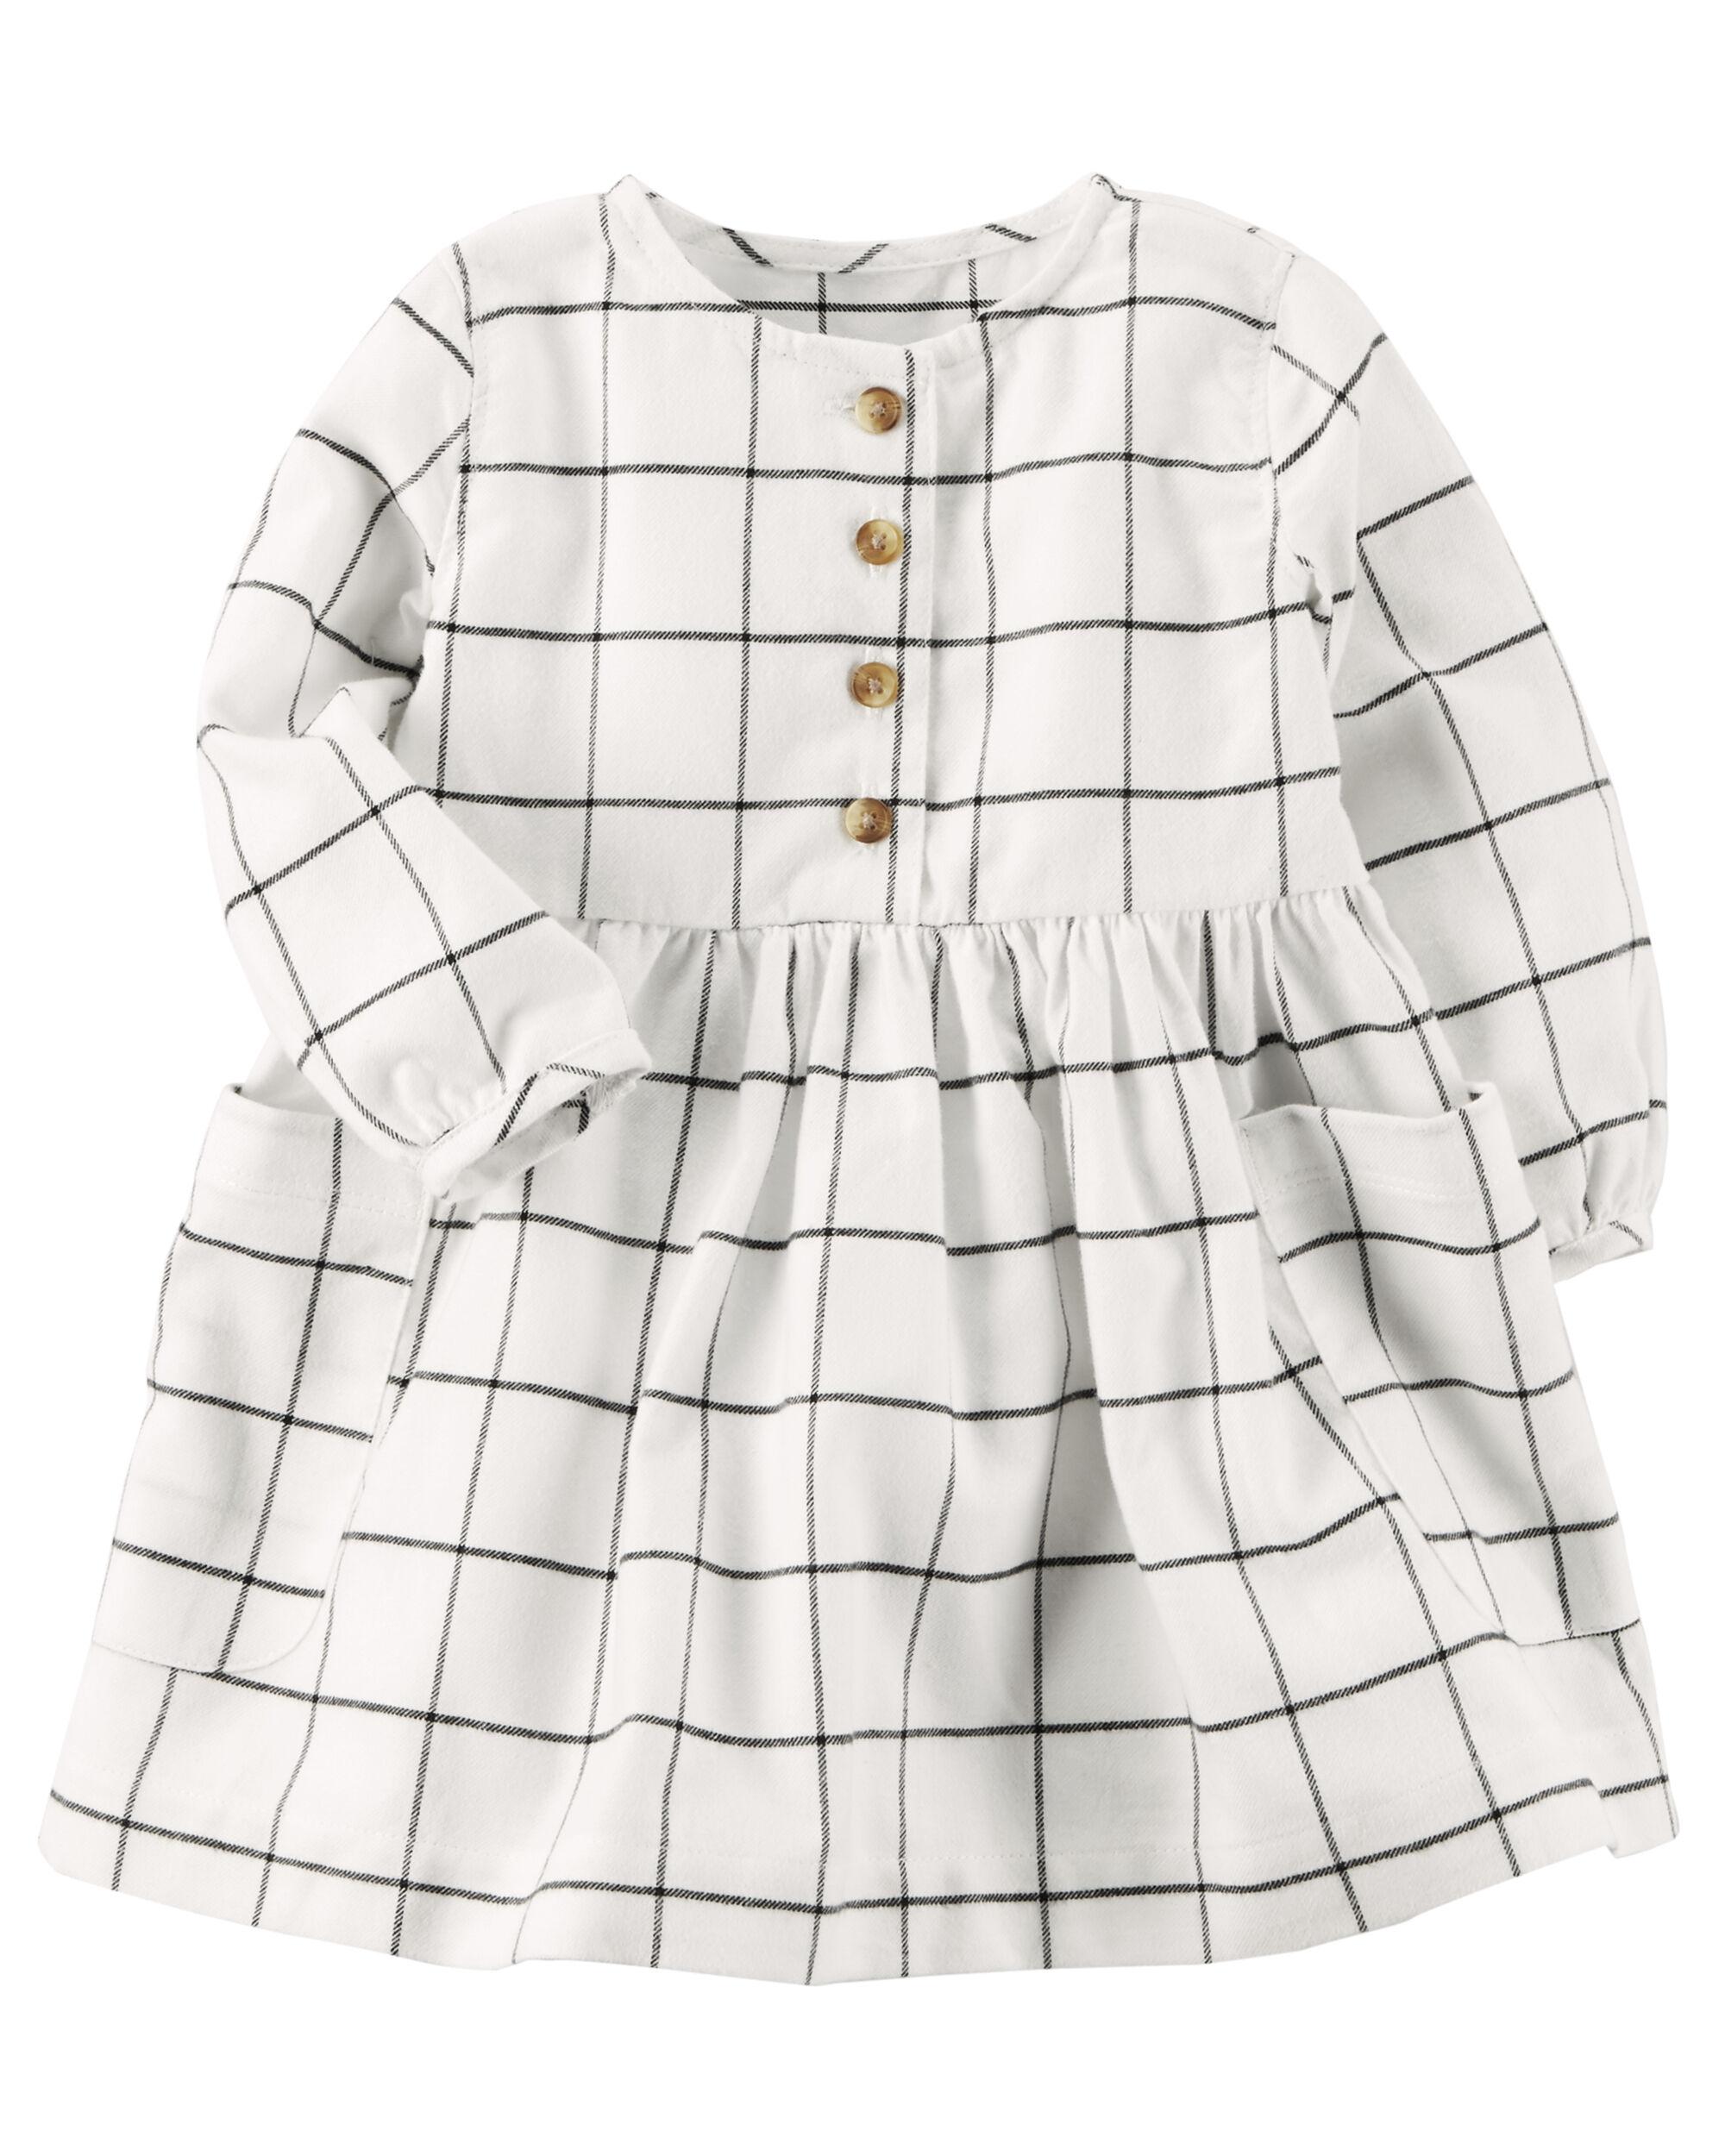 Baby Girl Woven Checkered Dress